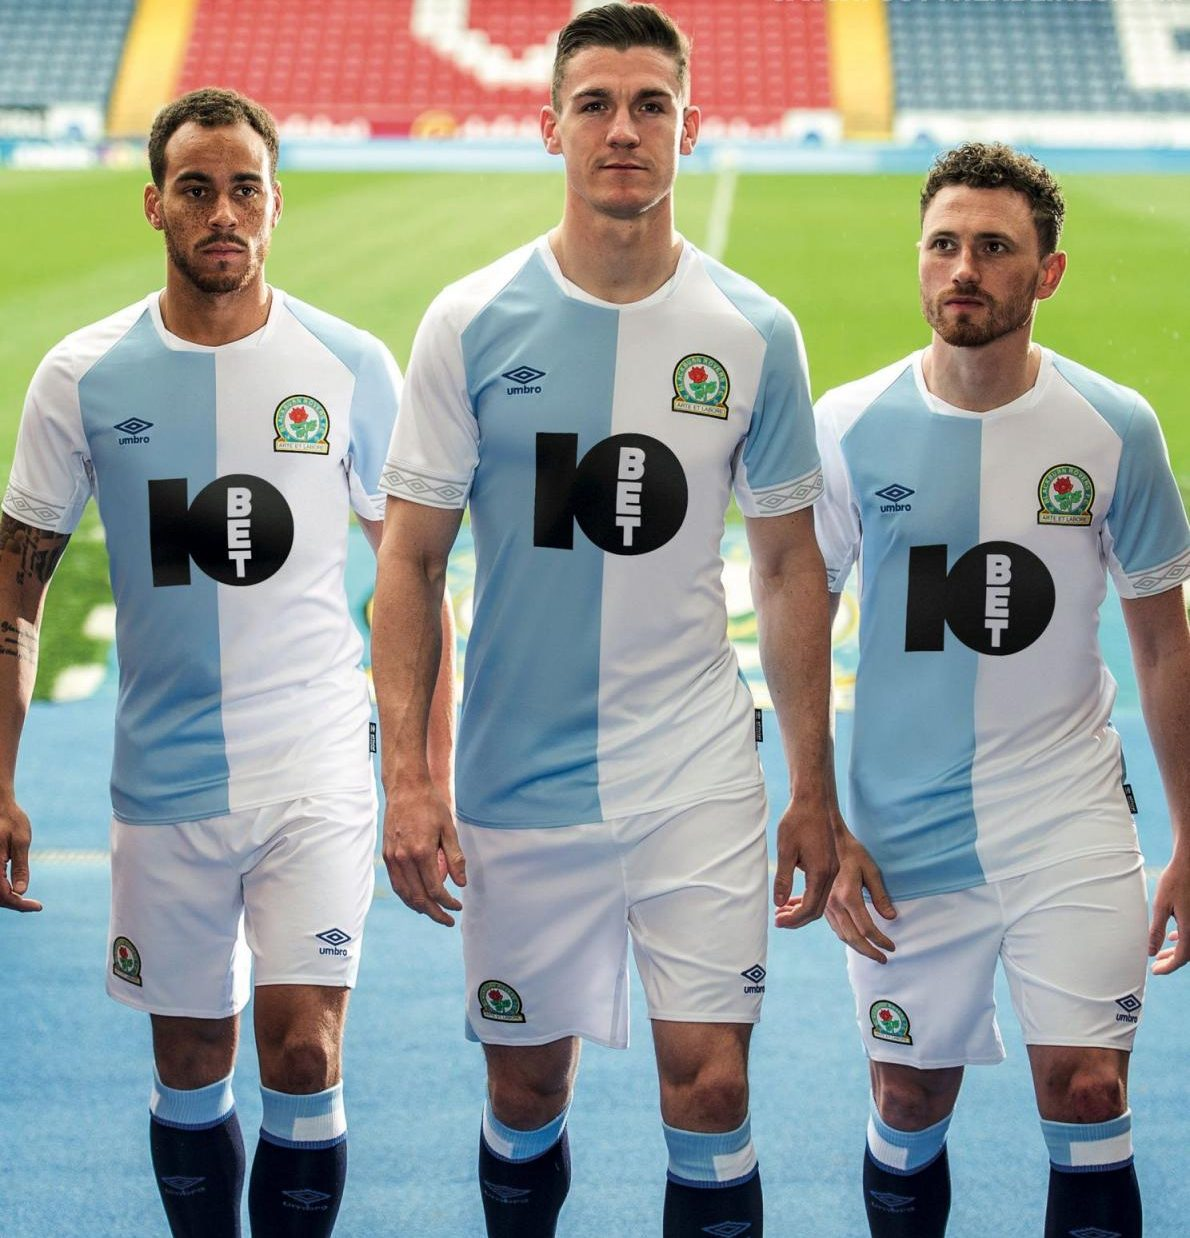 Blackburn Rovers 2018-19 Umbro Home Kit